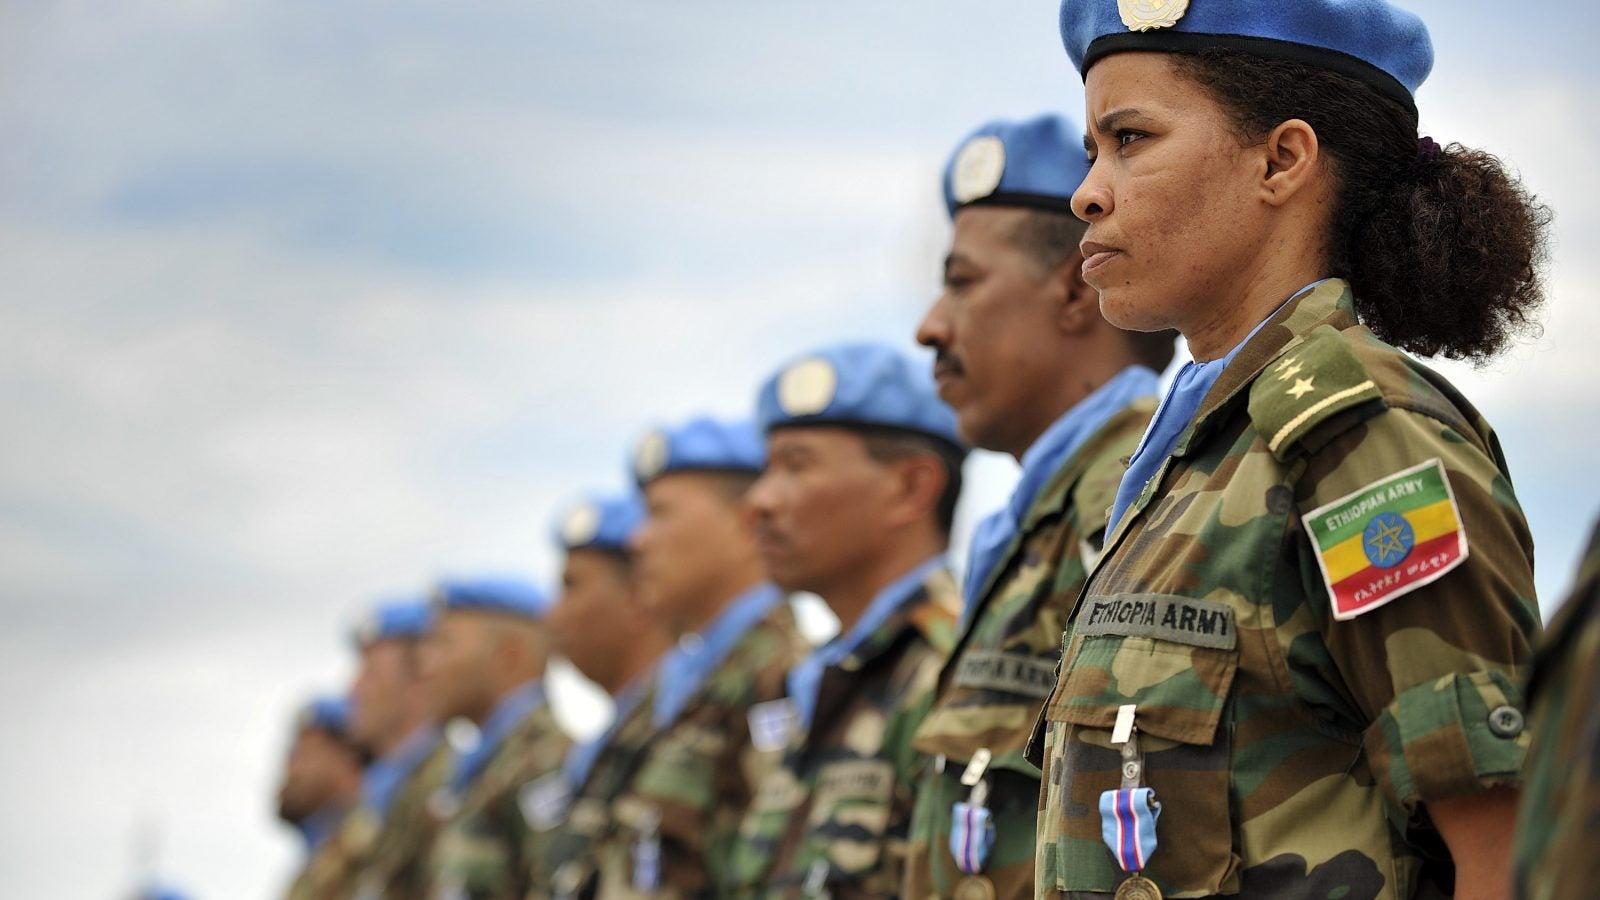 UN peacekeeping women.